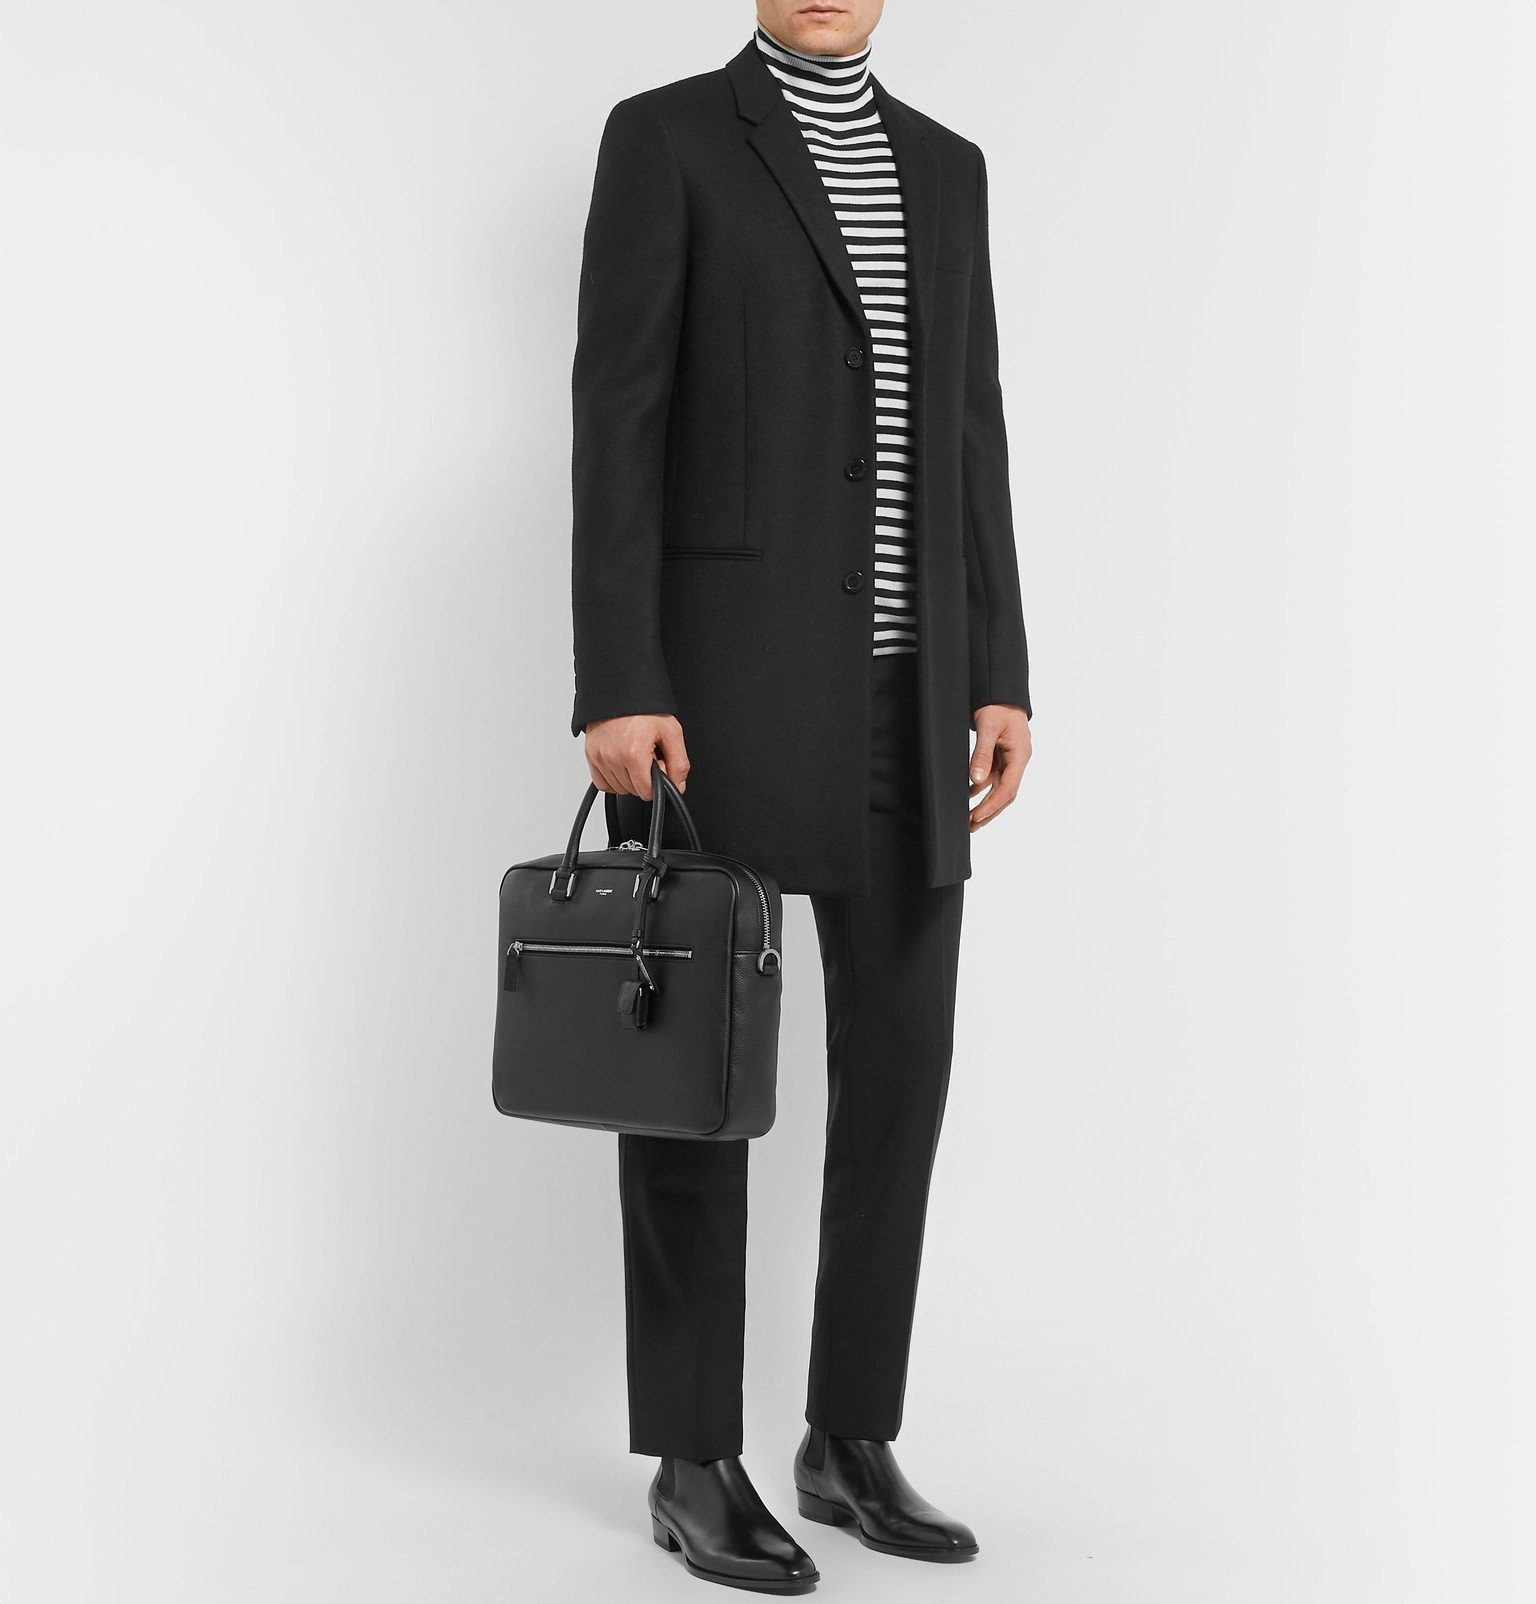 SAINT LAURENT - Full-Grain Leather Briefcase - Black